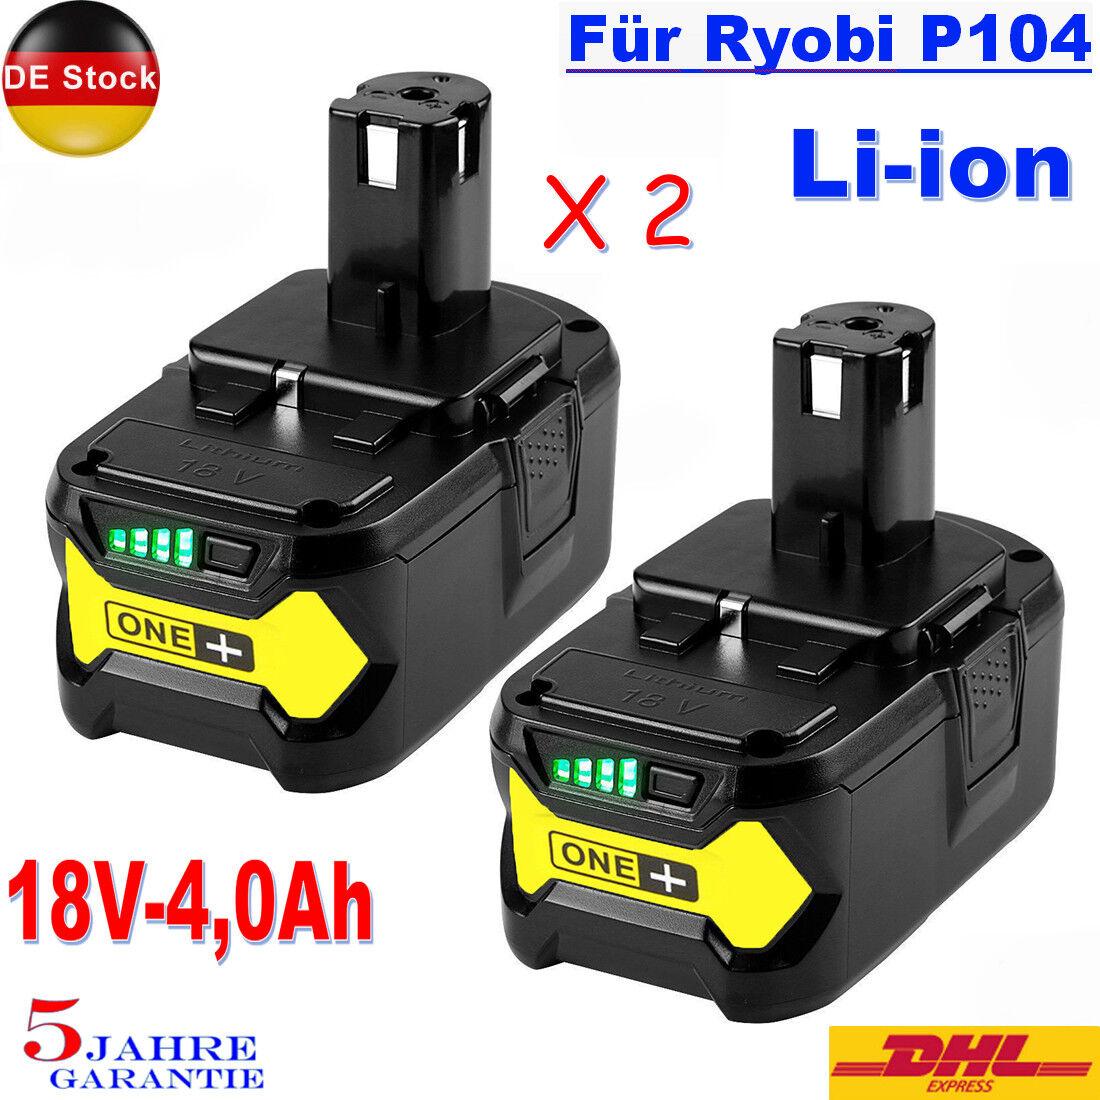 2X 18V Für P108 Ryobi One Plus High Capacity Akku P104 P105 P107 Batterie 4,0Ah